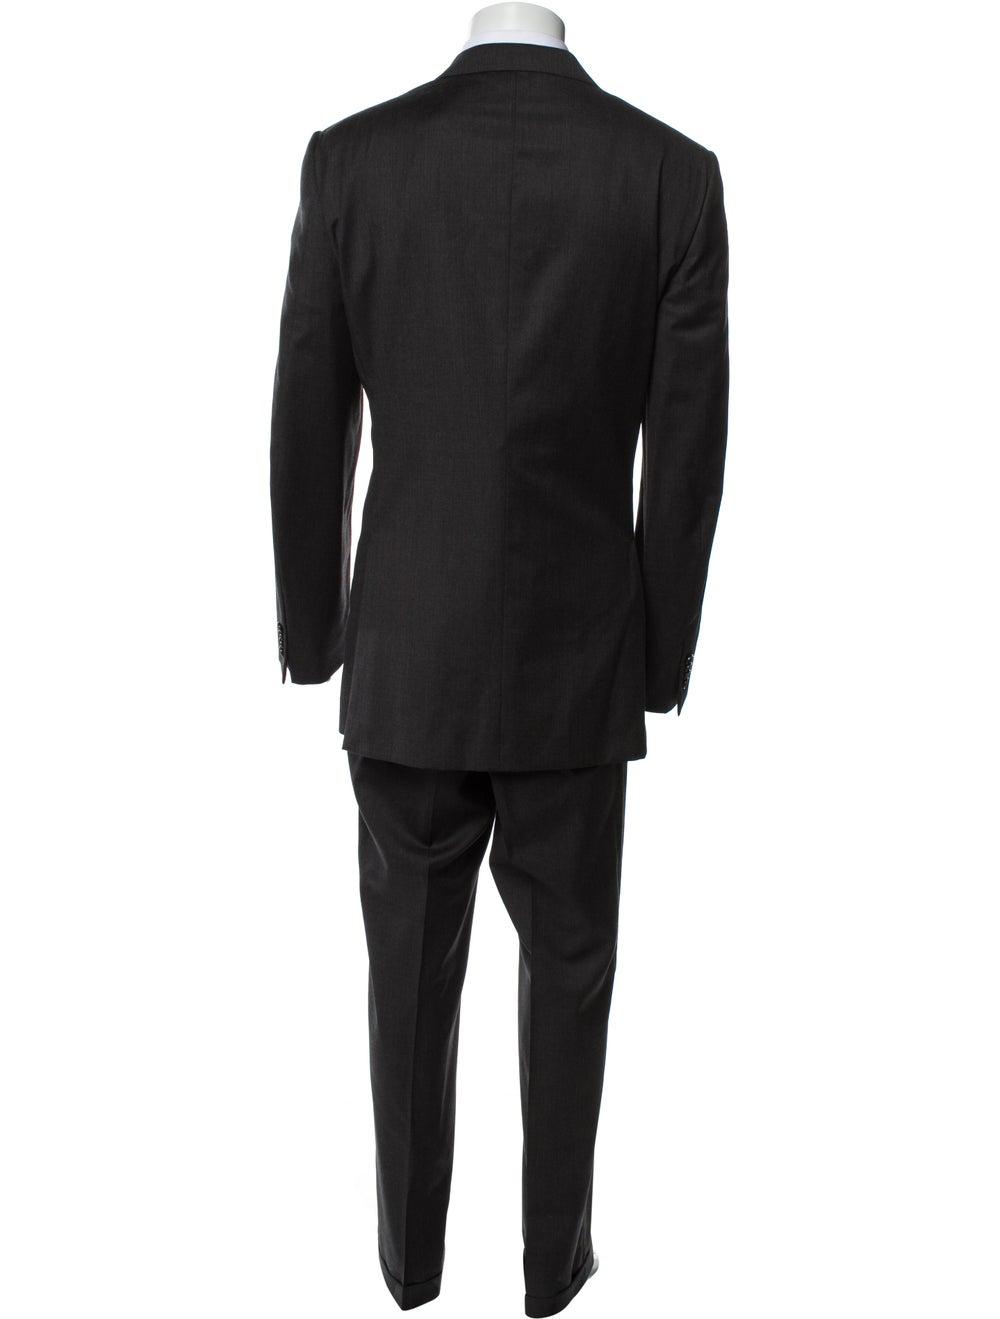 Ermenegildo Zegna Wool Two-Piece Suit Wool - image 3